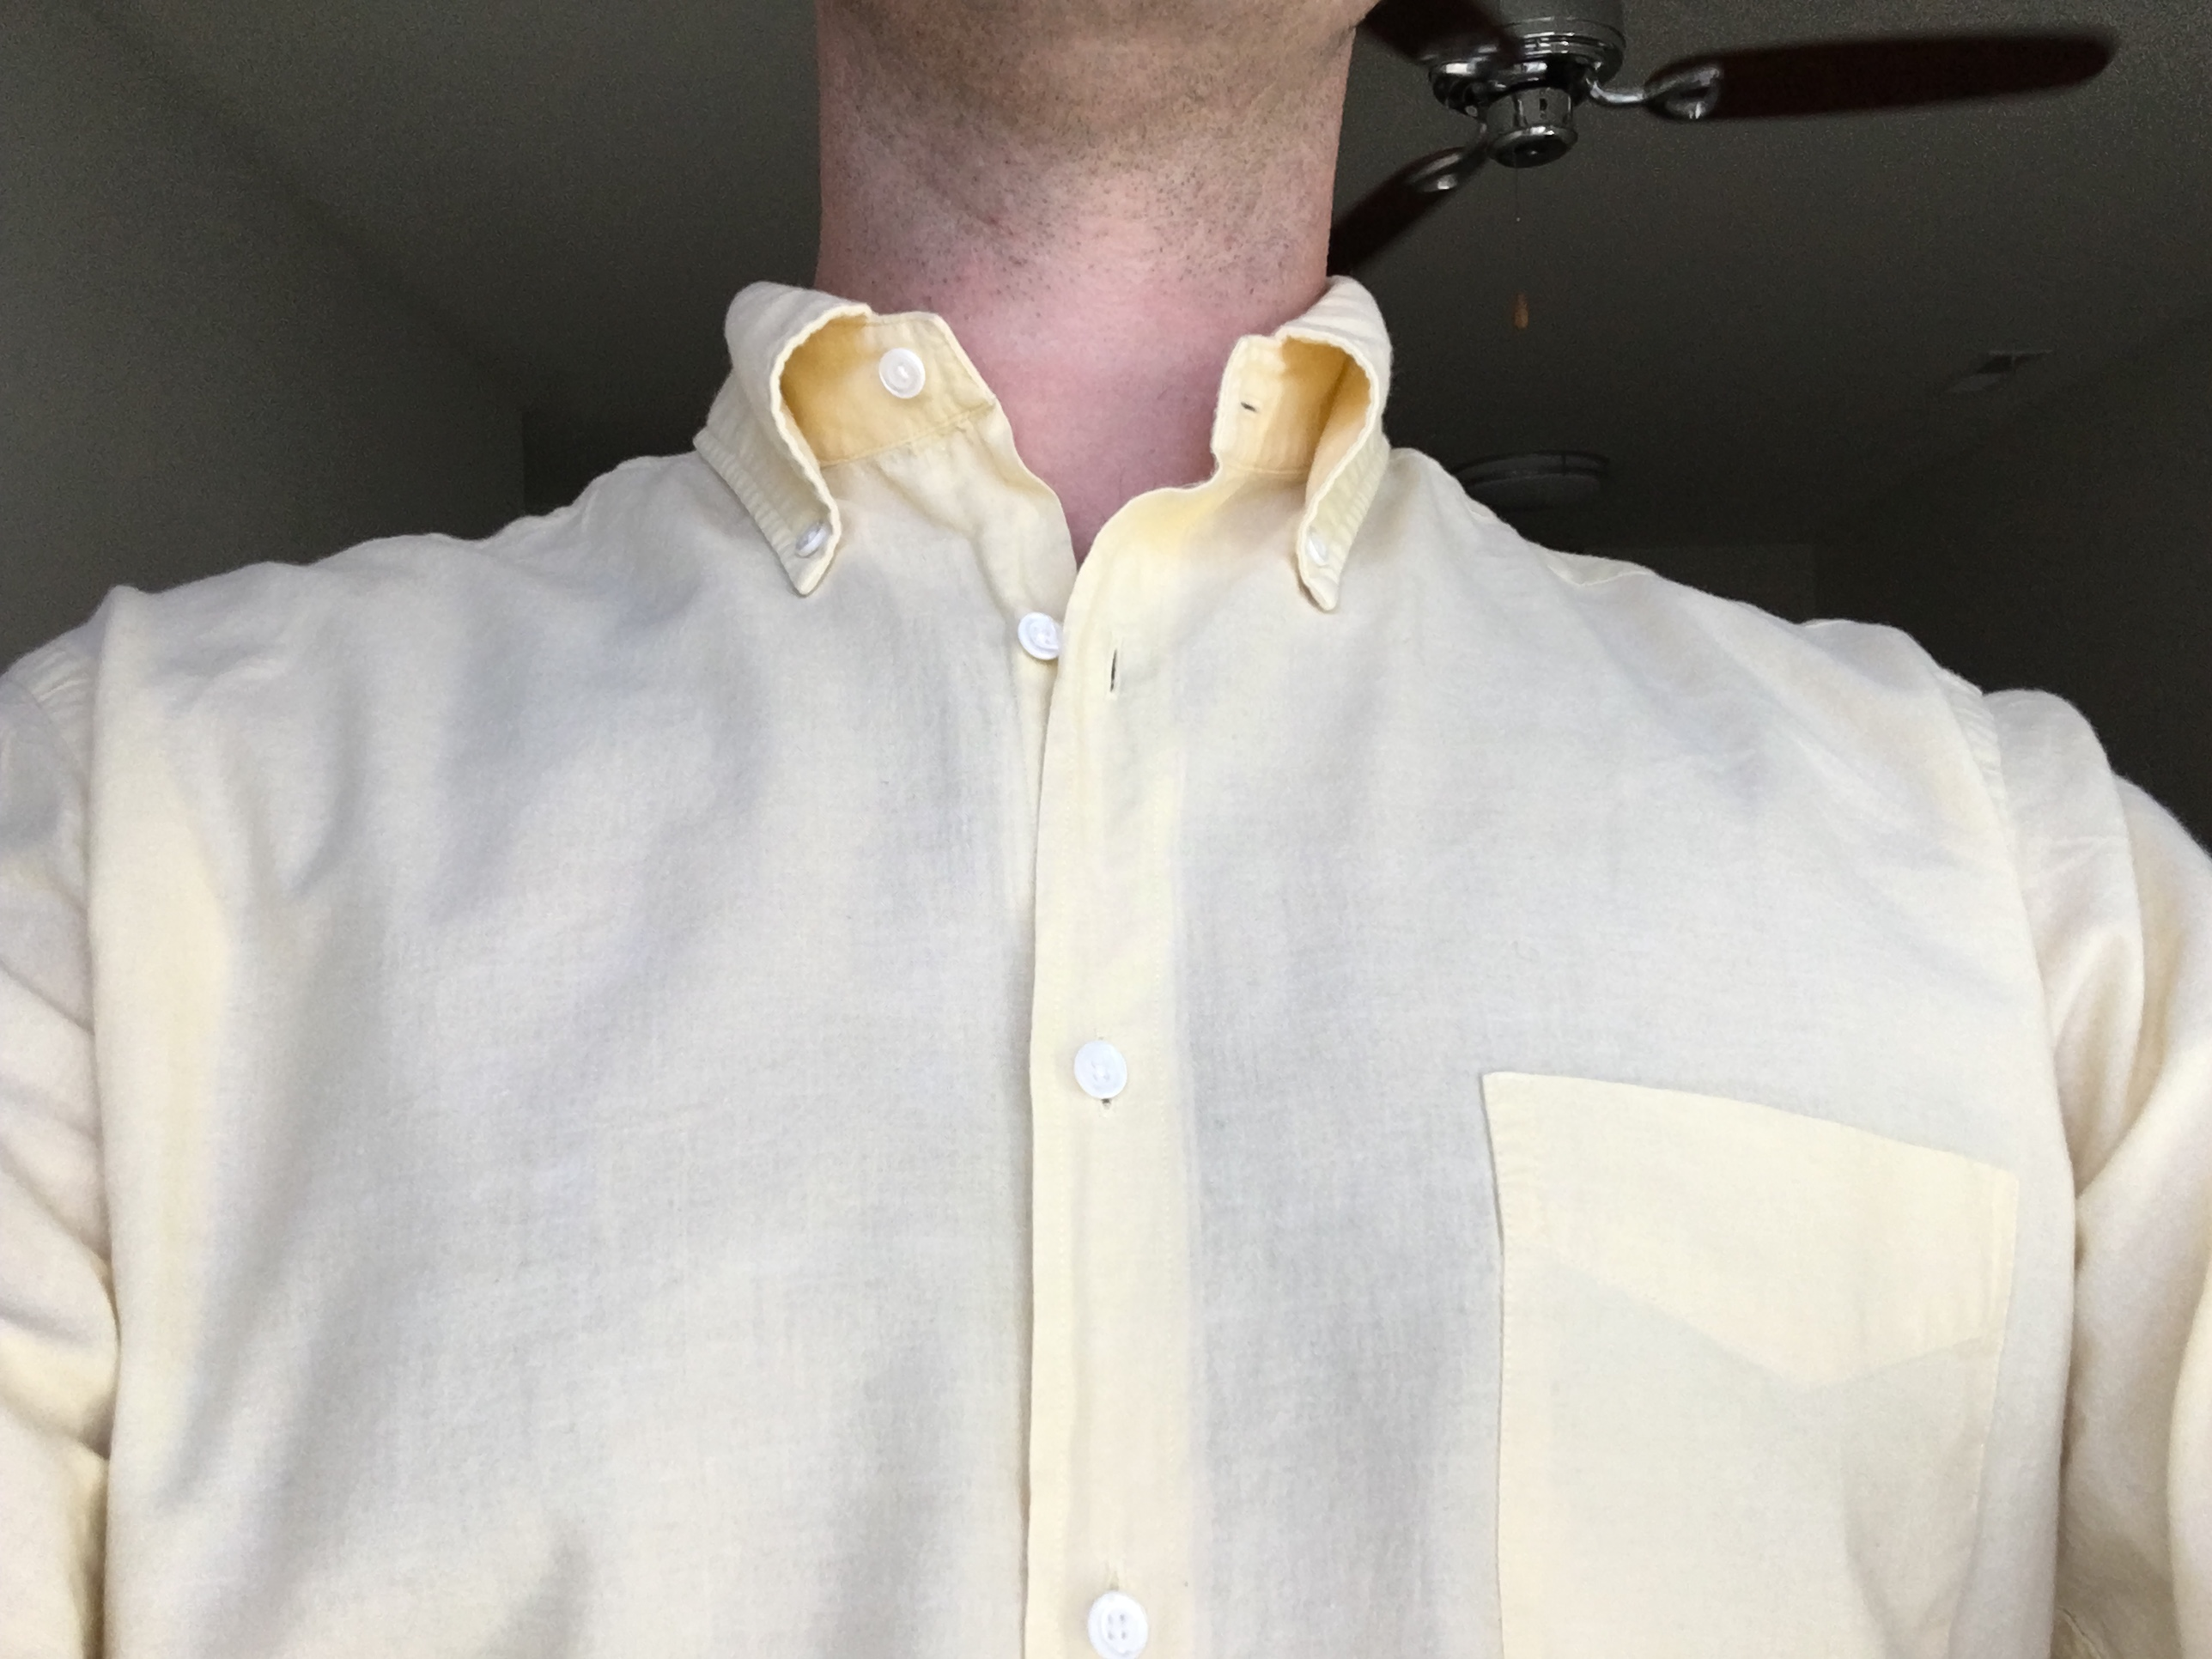 Van Veen's photos in The OCBD collar roll thread